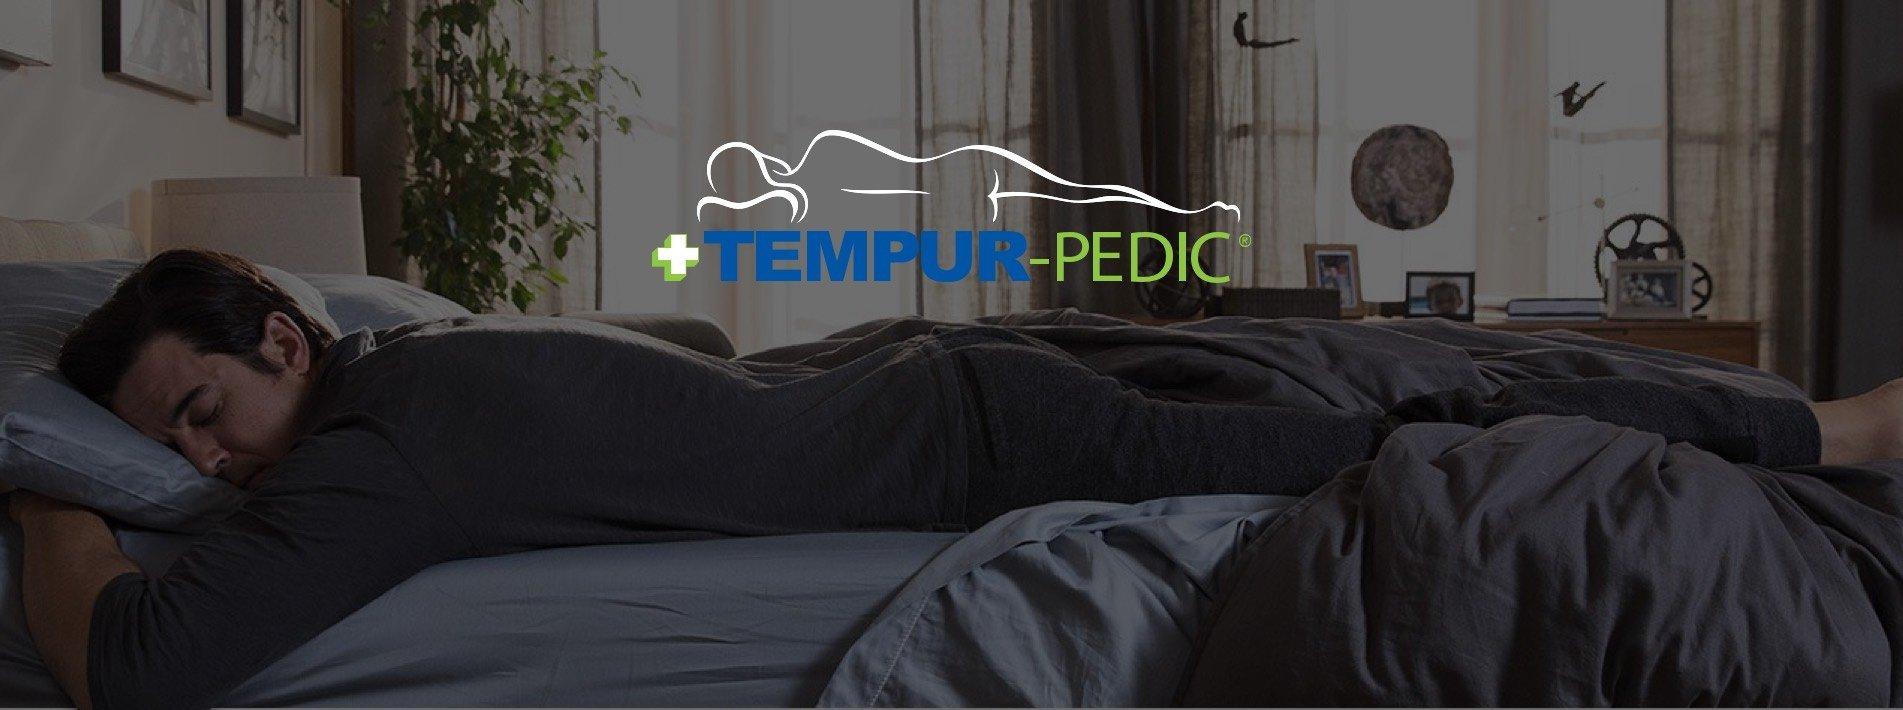 TempurPedic2